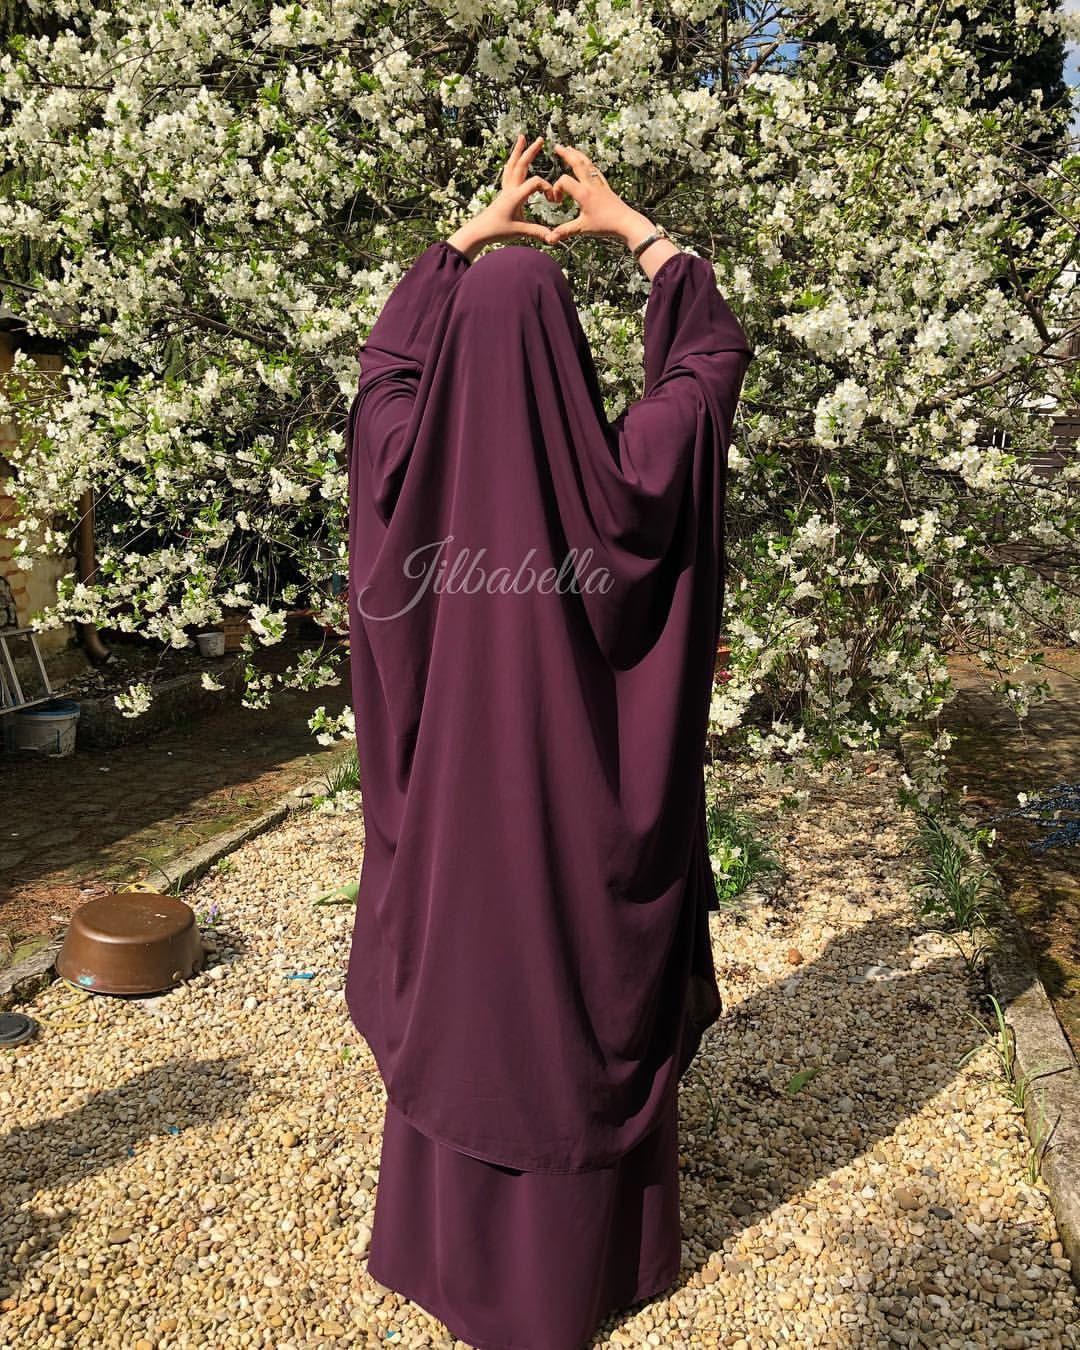 Muslima Com Se Connecter : muslima, connecter, Jilbab, #nichtohnemeinkopftuch, #jilbabiforlife, #hijabi, #jilbabi, Muslima, Kızlar,, Abayalar,, Fotoğraf